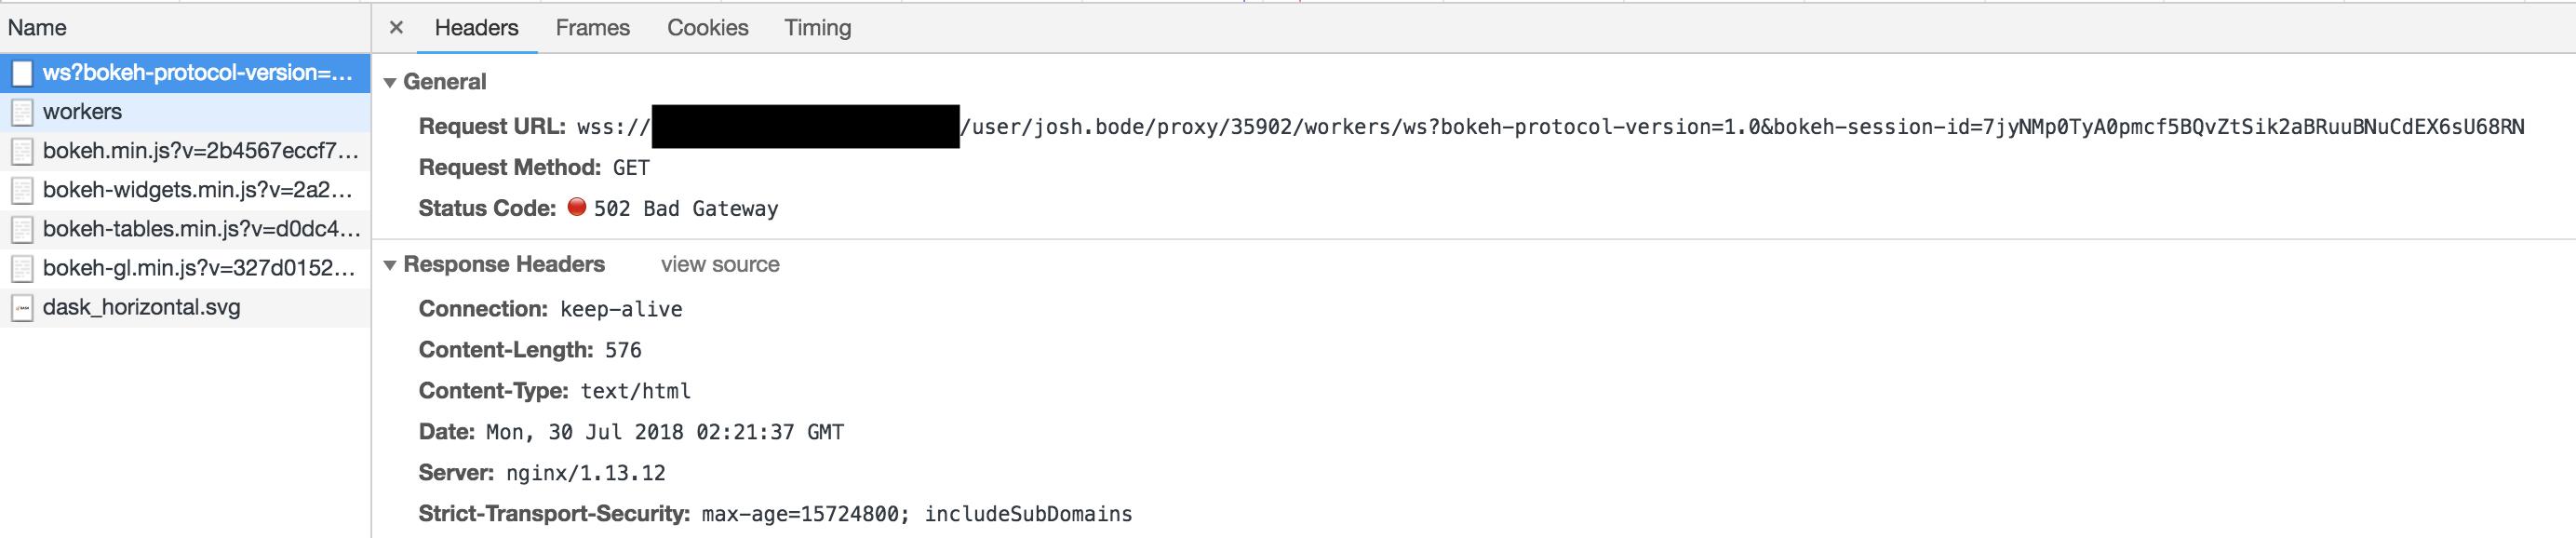 502 During Web Socket Handshake · Issue #39 · jupyterhub